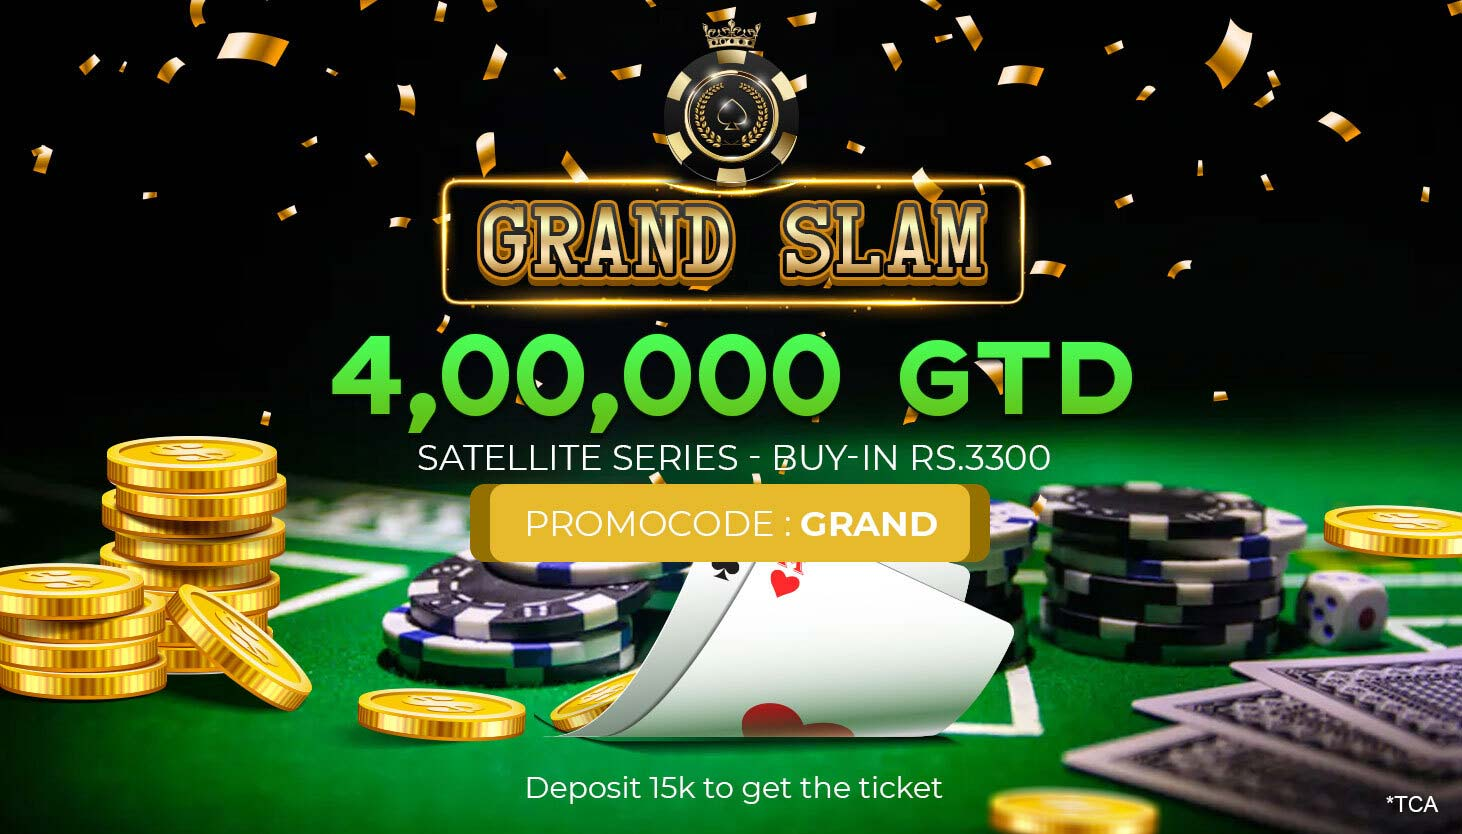 Poker Promotion | Tournaments | GRAND SLAM 4L GTD